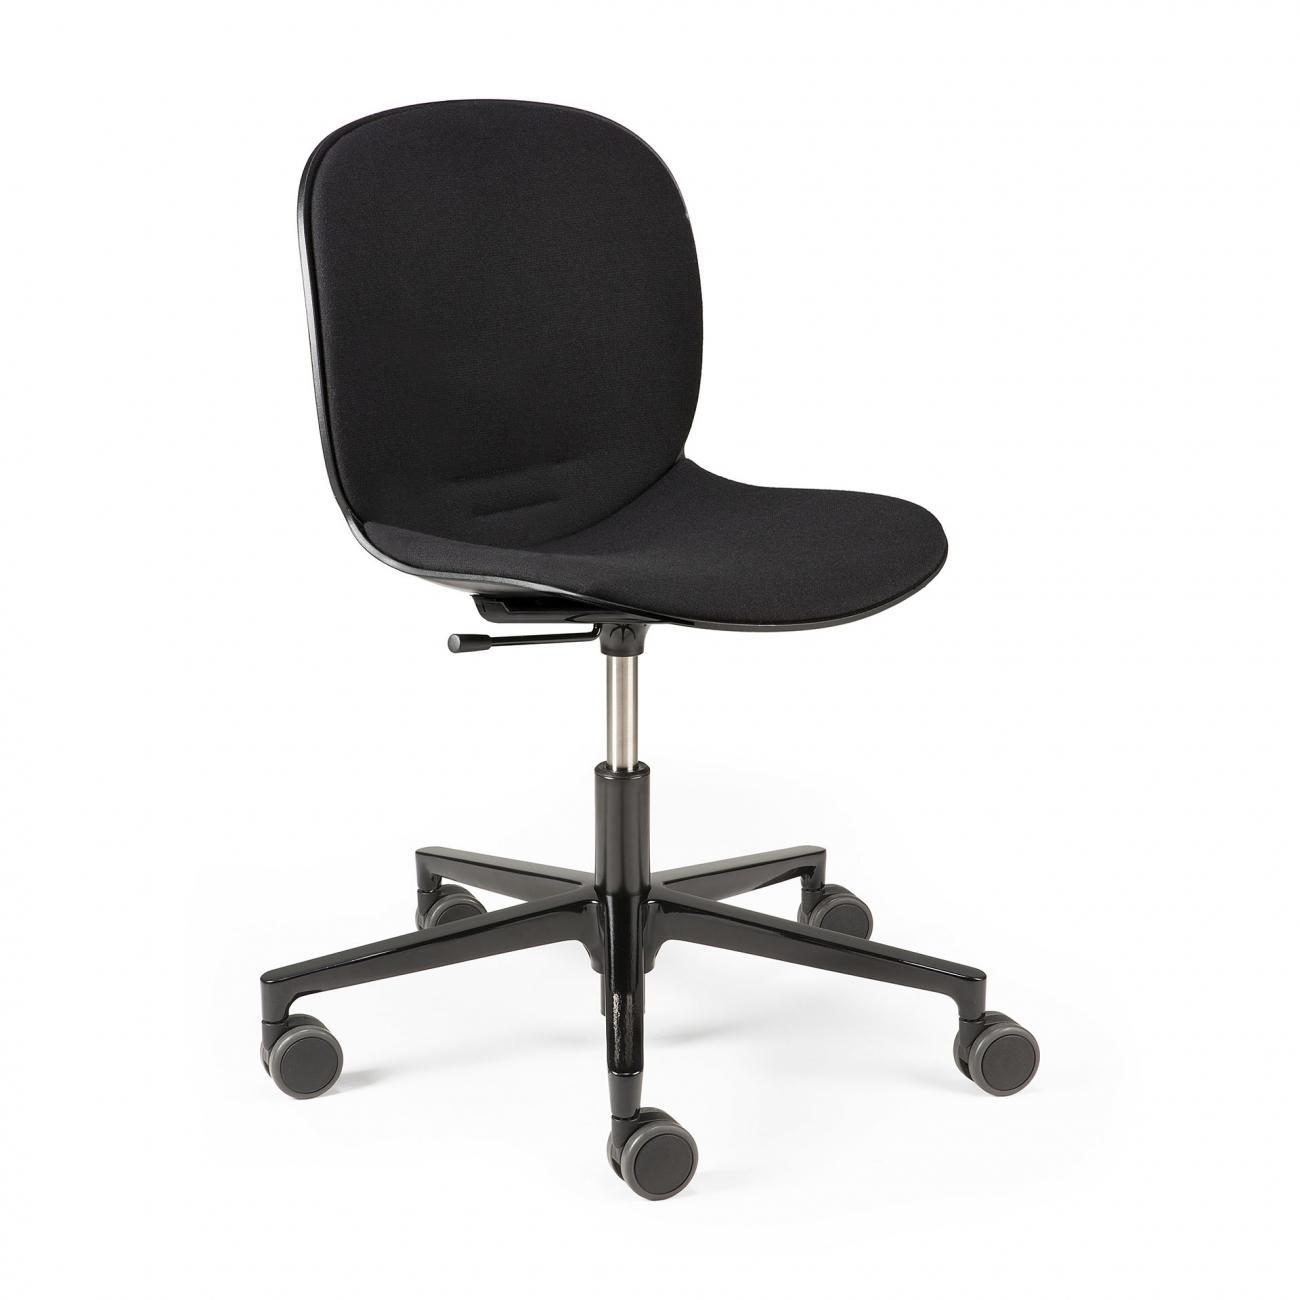 https://www.fundesign.nl/media/catalog/product/2/6/26013_rbm_noor_office_chair_black_side01_cut_web.jpg